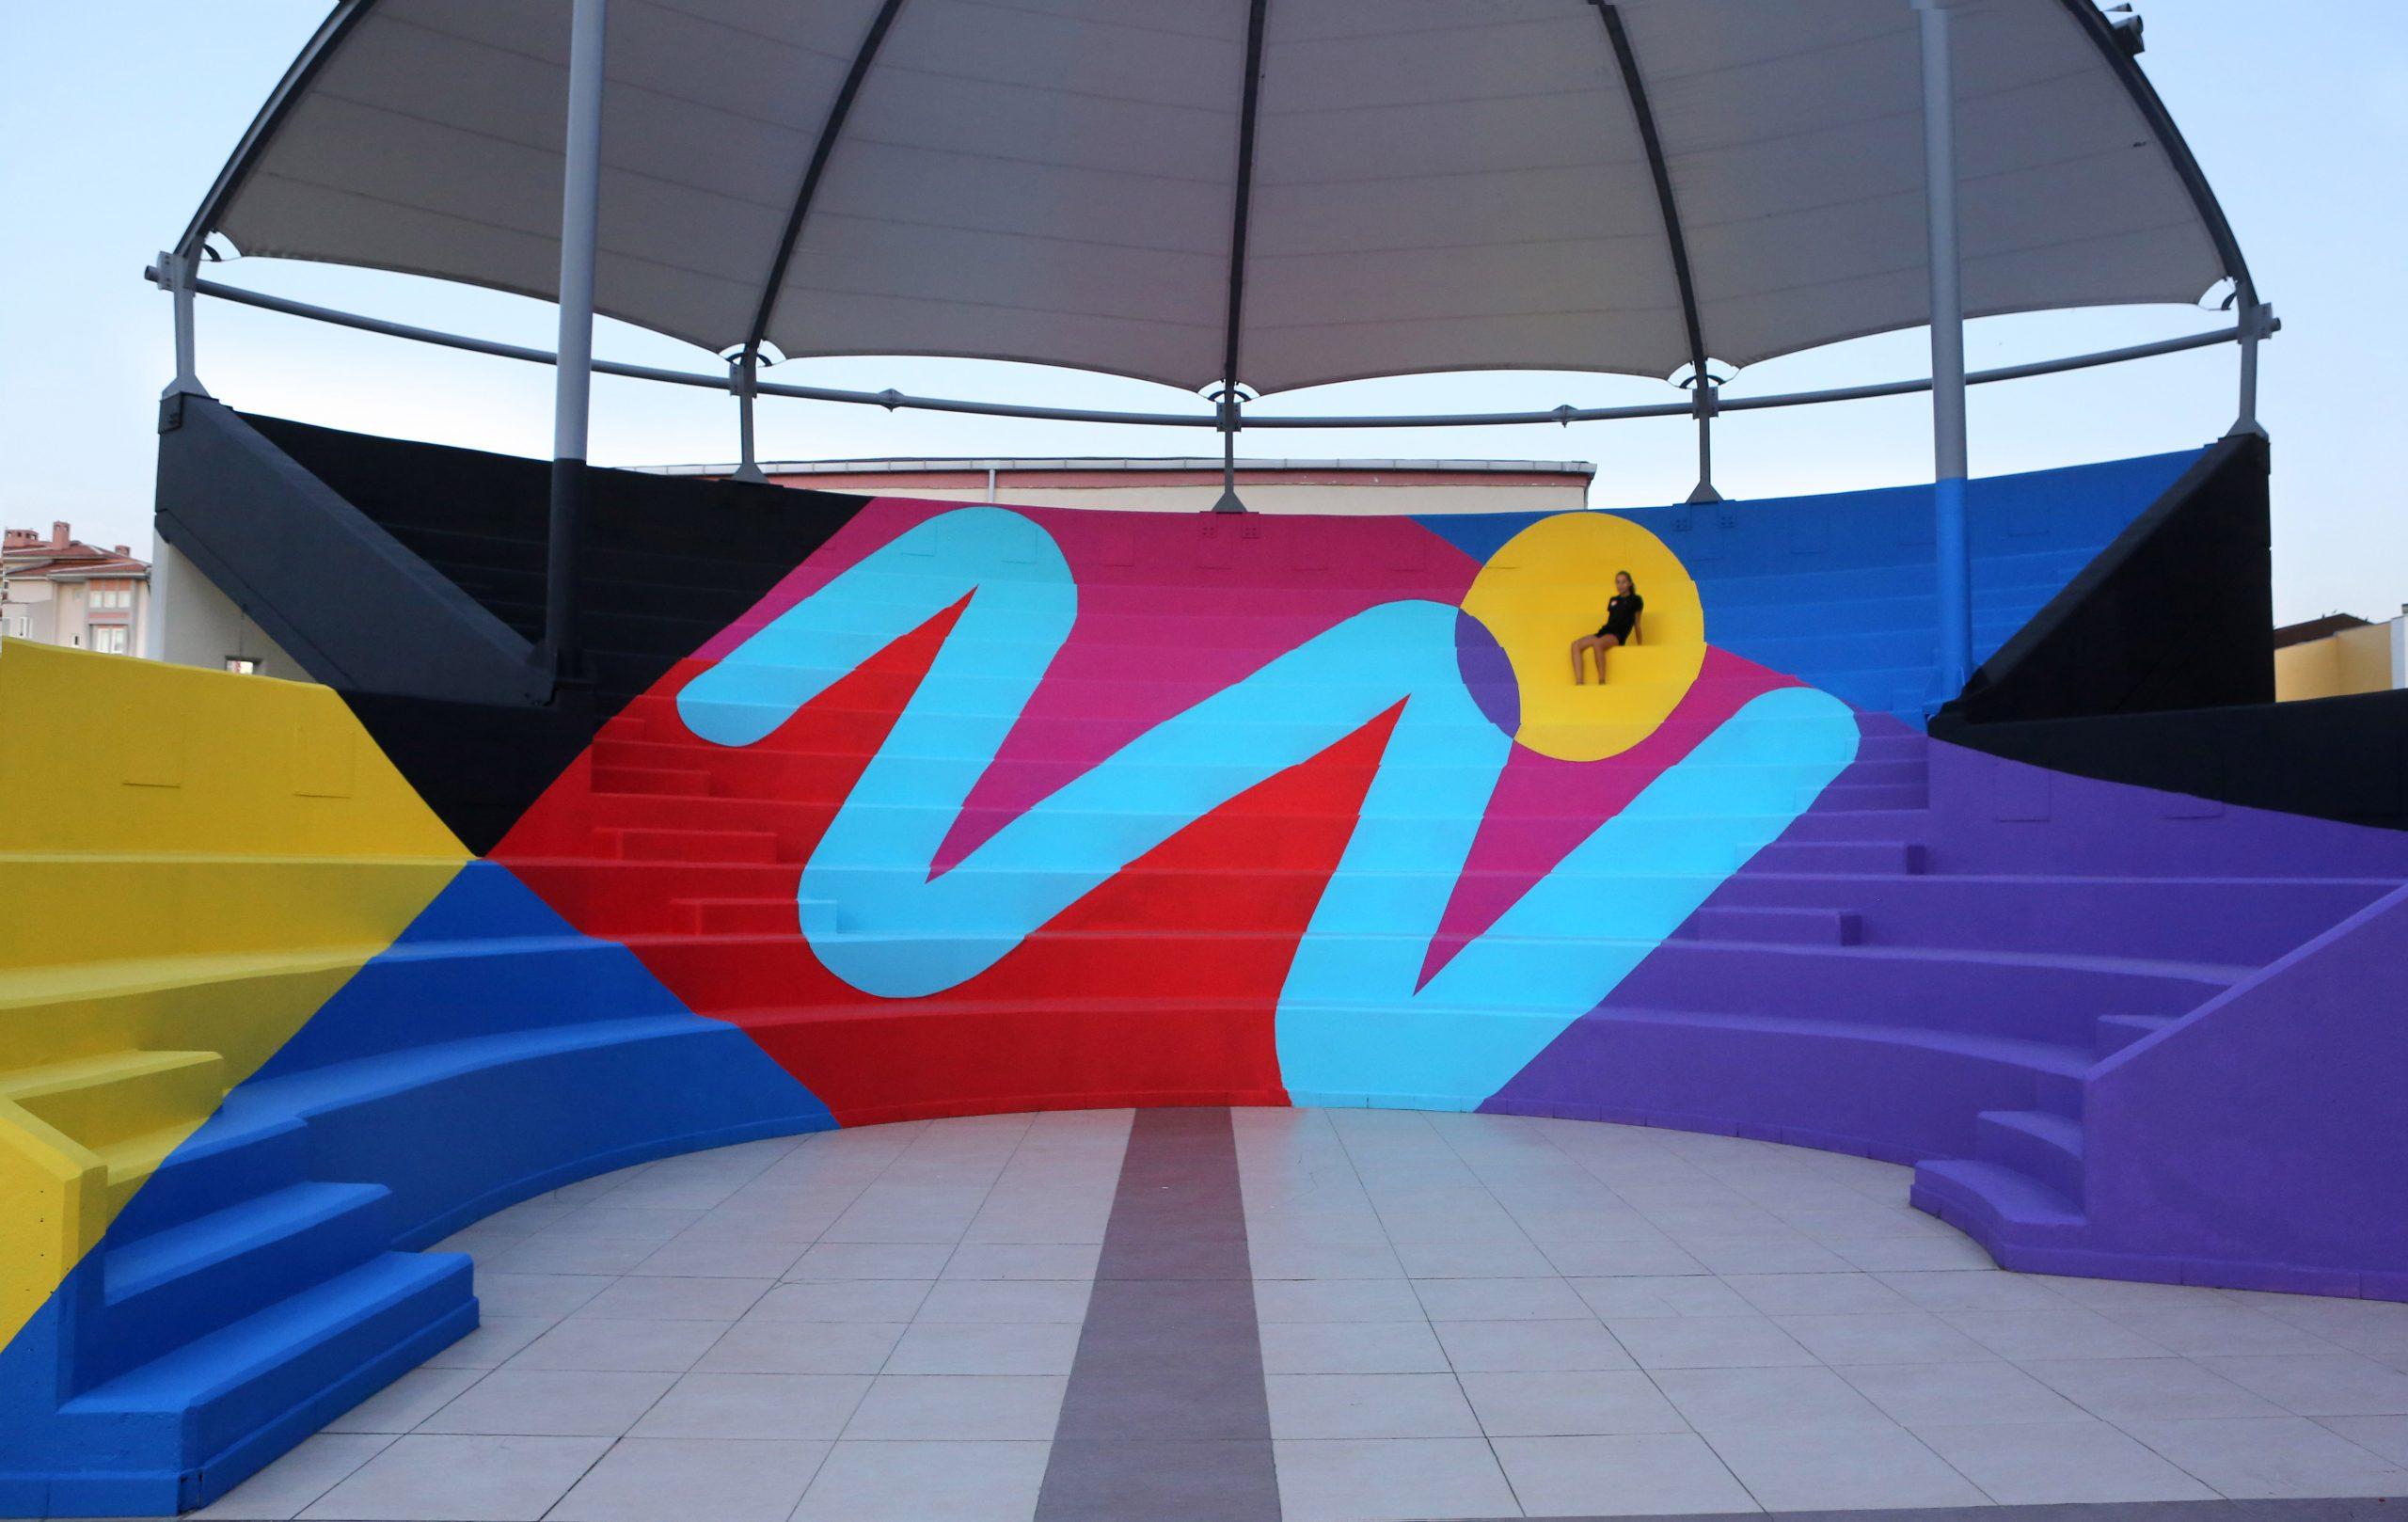 Anphitheater in Istambul, Turkey